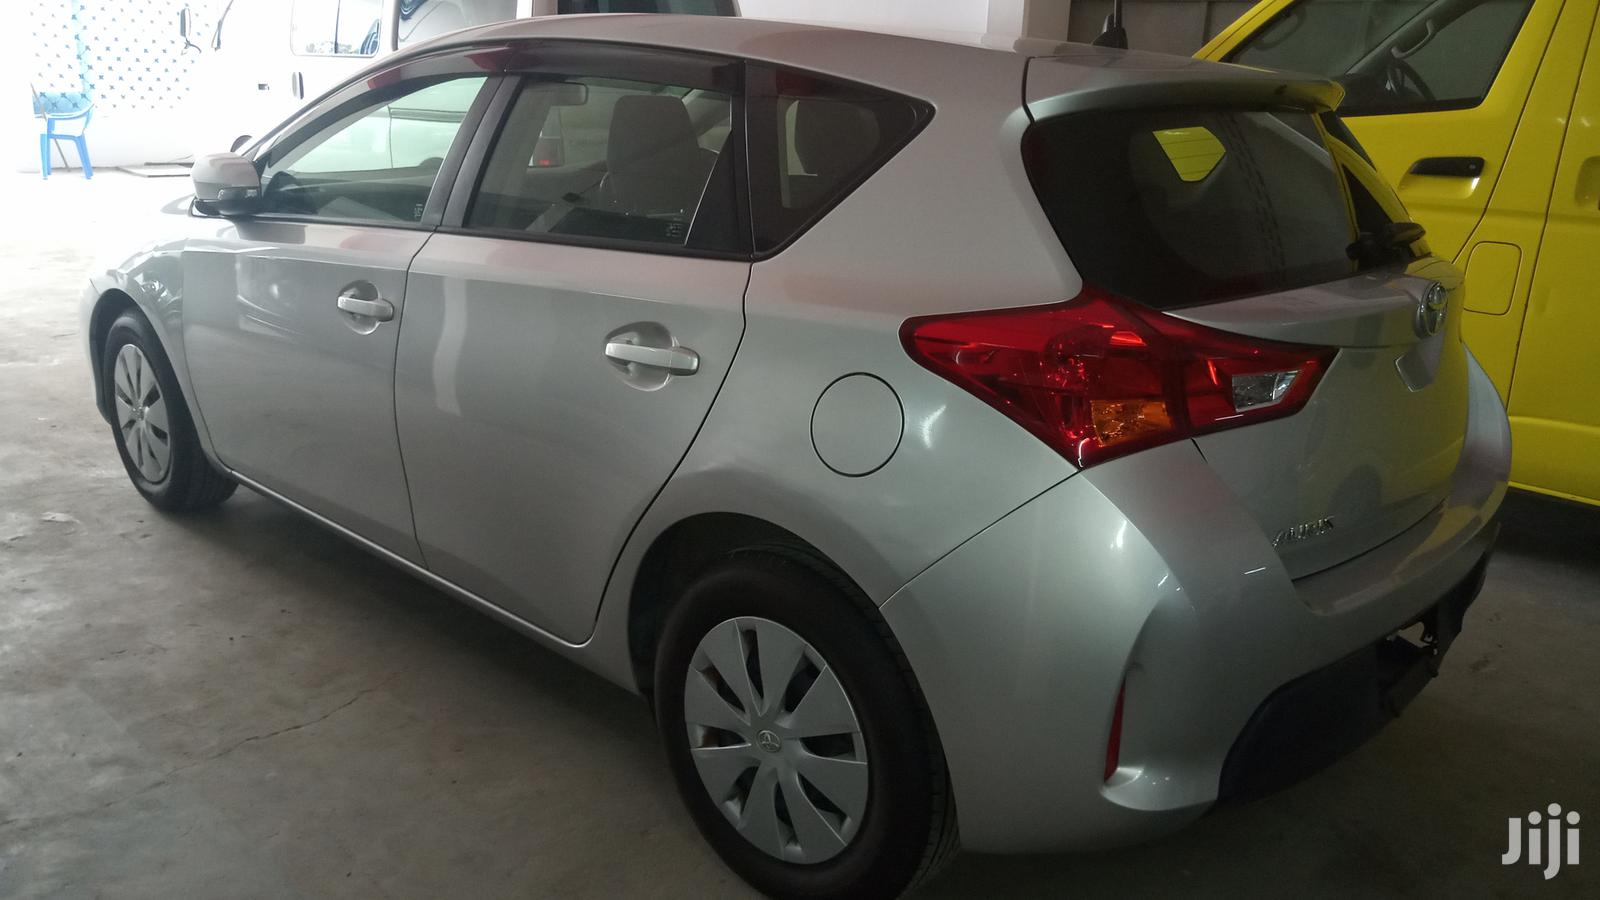 Toyota Auris 2012 Silver | Cars for sale in Mvita, Mombasa, Kenya